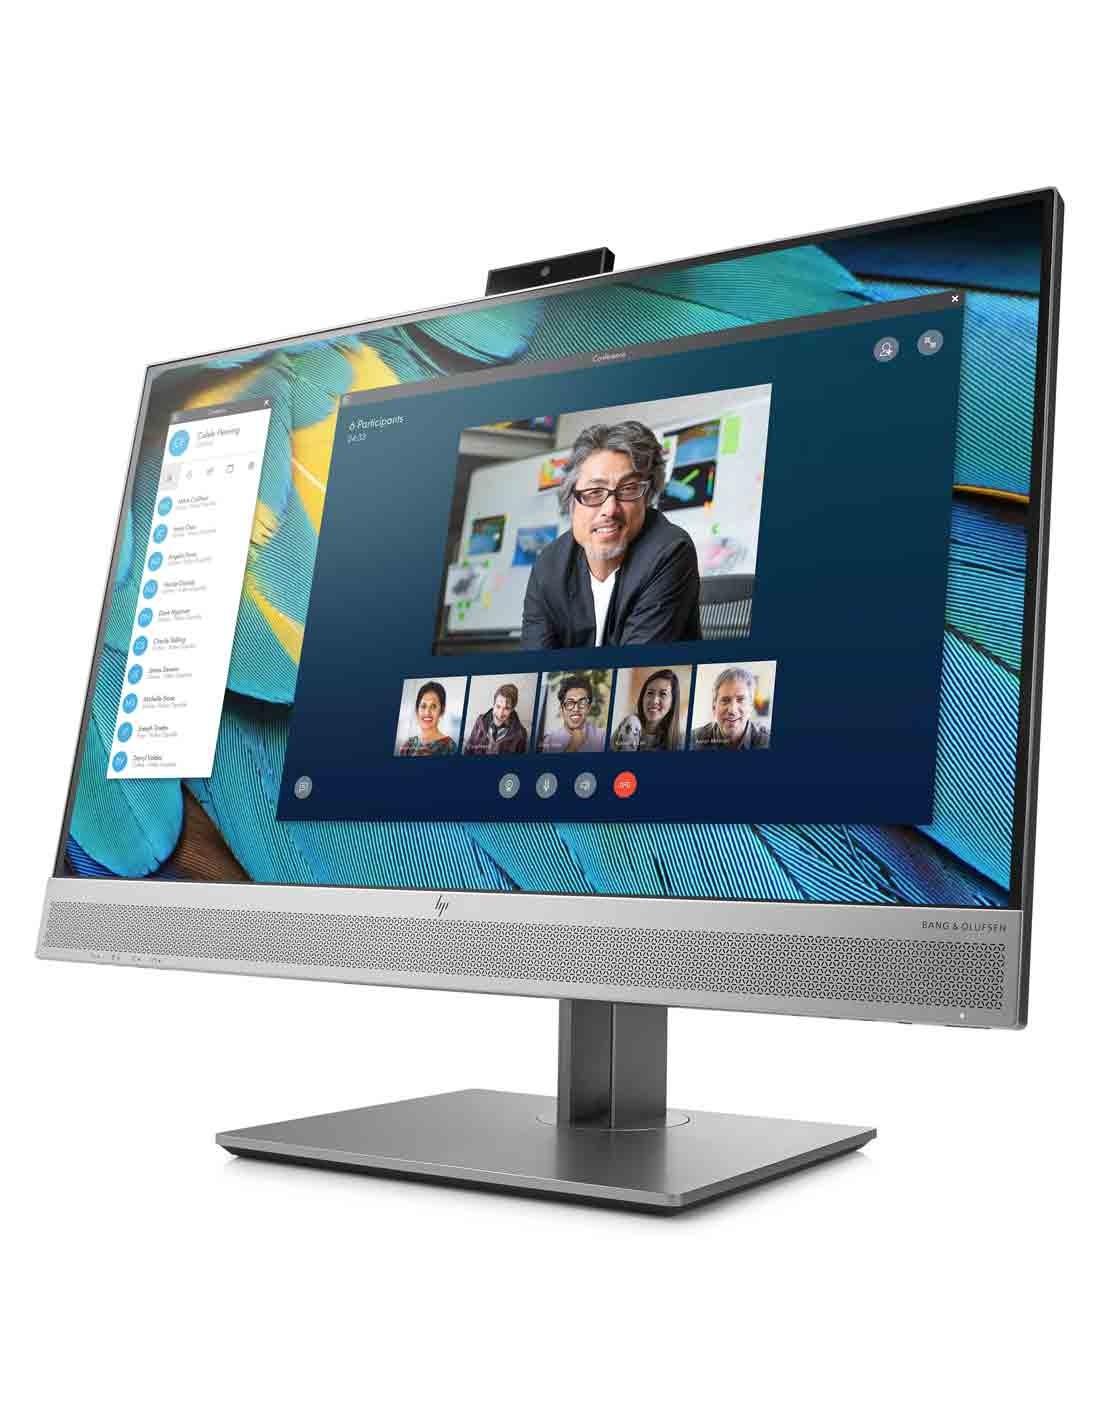 HP EliteDisplay E243m 23.8-inch Monitor images